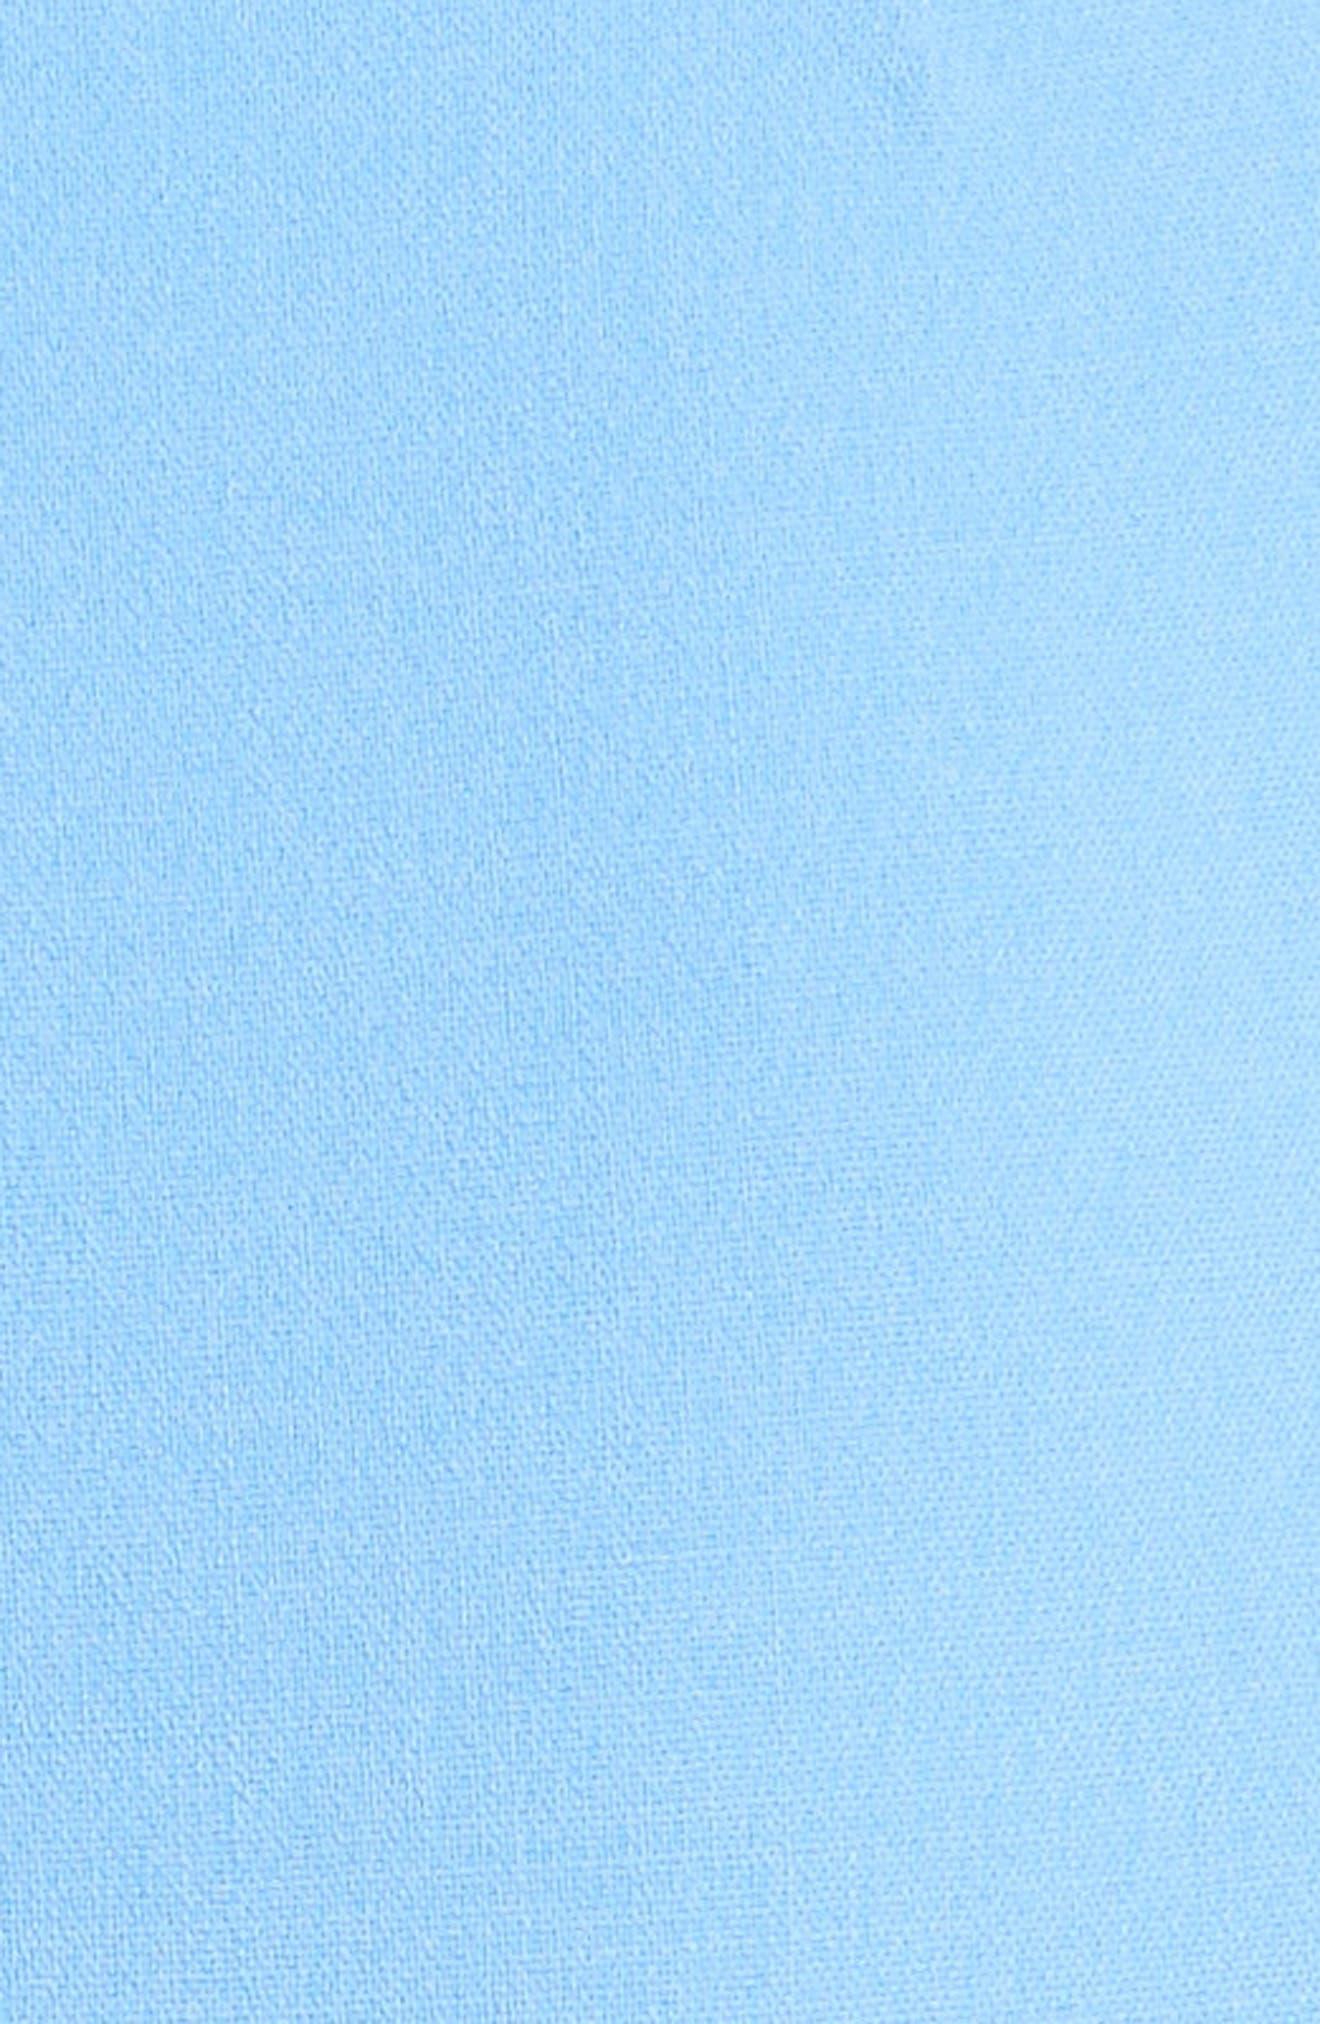 Stretch Wool Crepe Sheath Dress,                             Alternate thumbnail 6, color,                             495